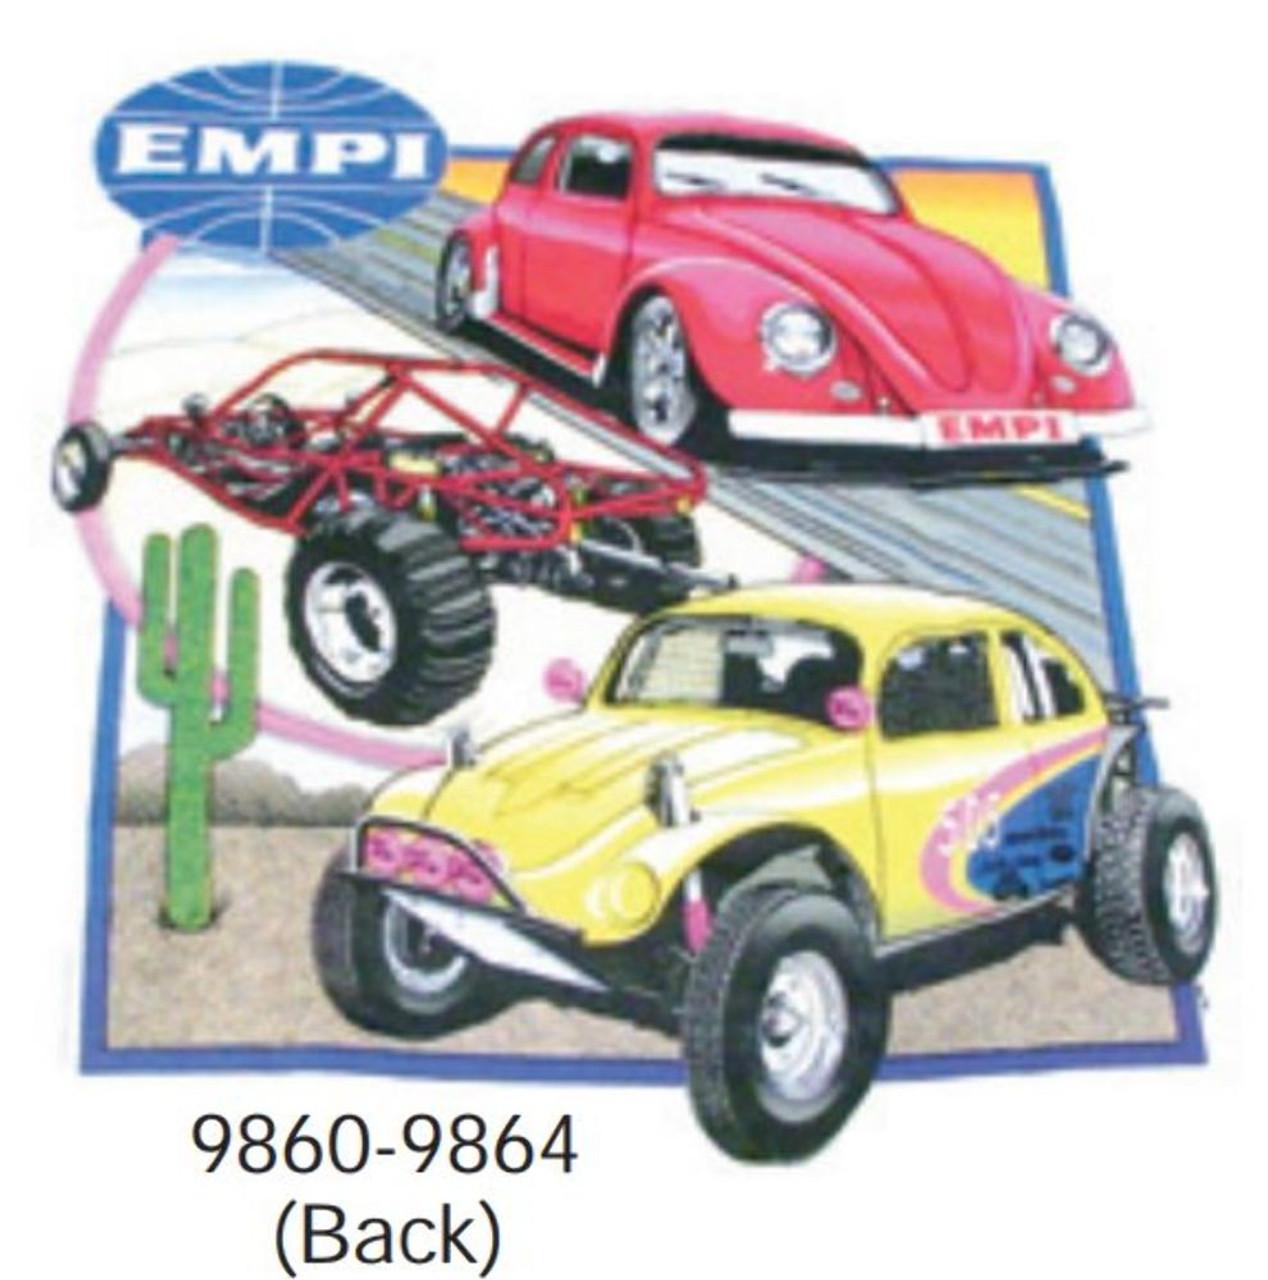 00-9862-0 EMPI T-SHIRT, LARGE